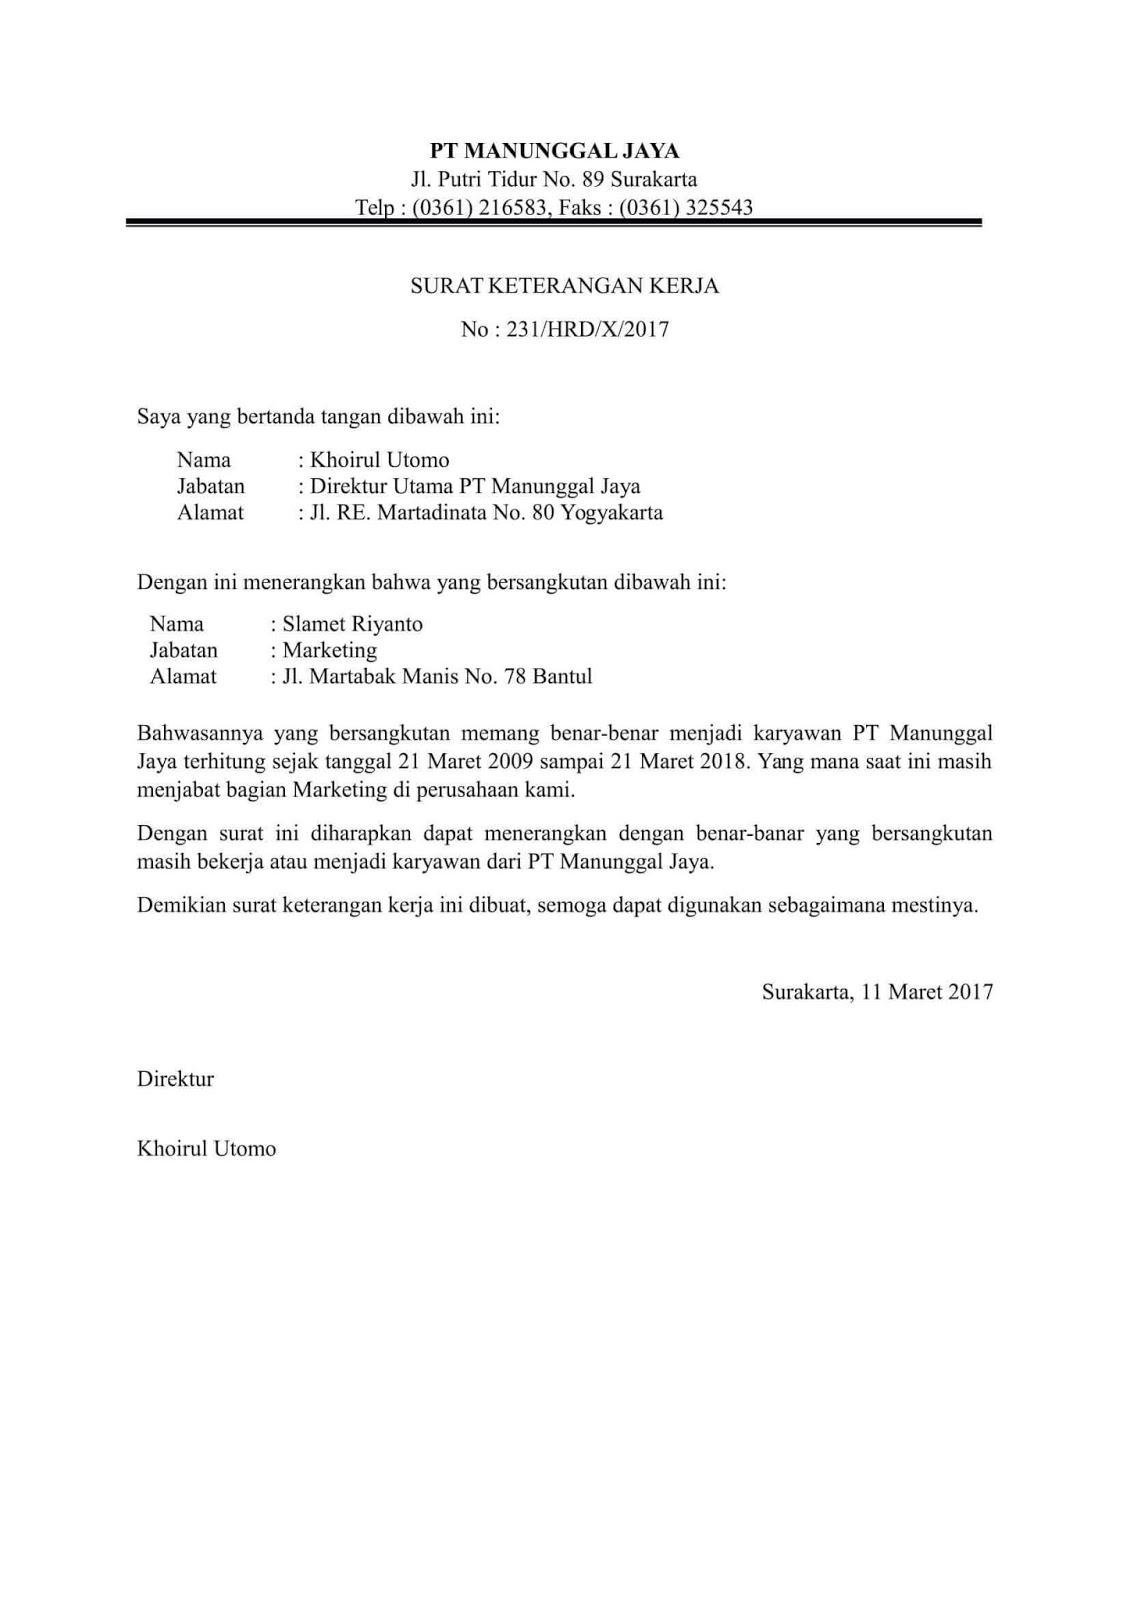 Contoh Surat Keterangan Karyawan